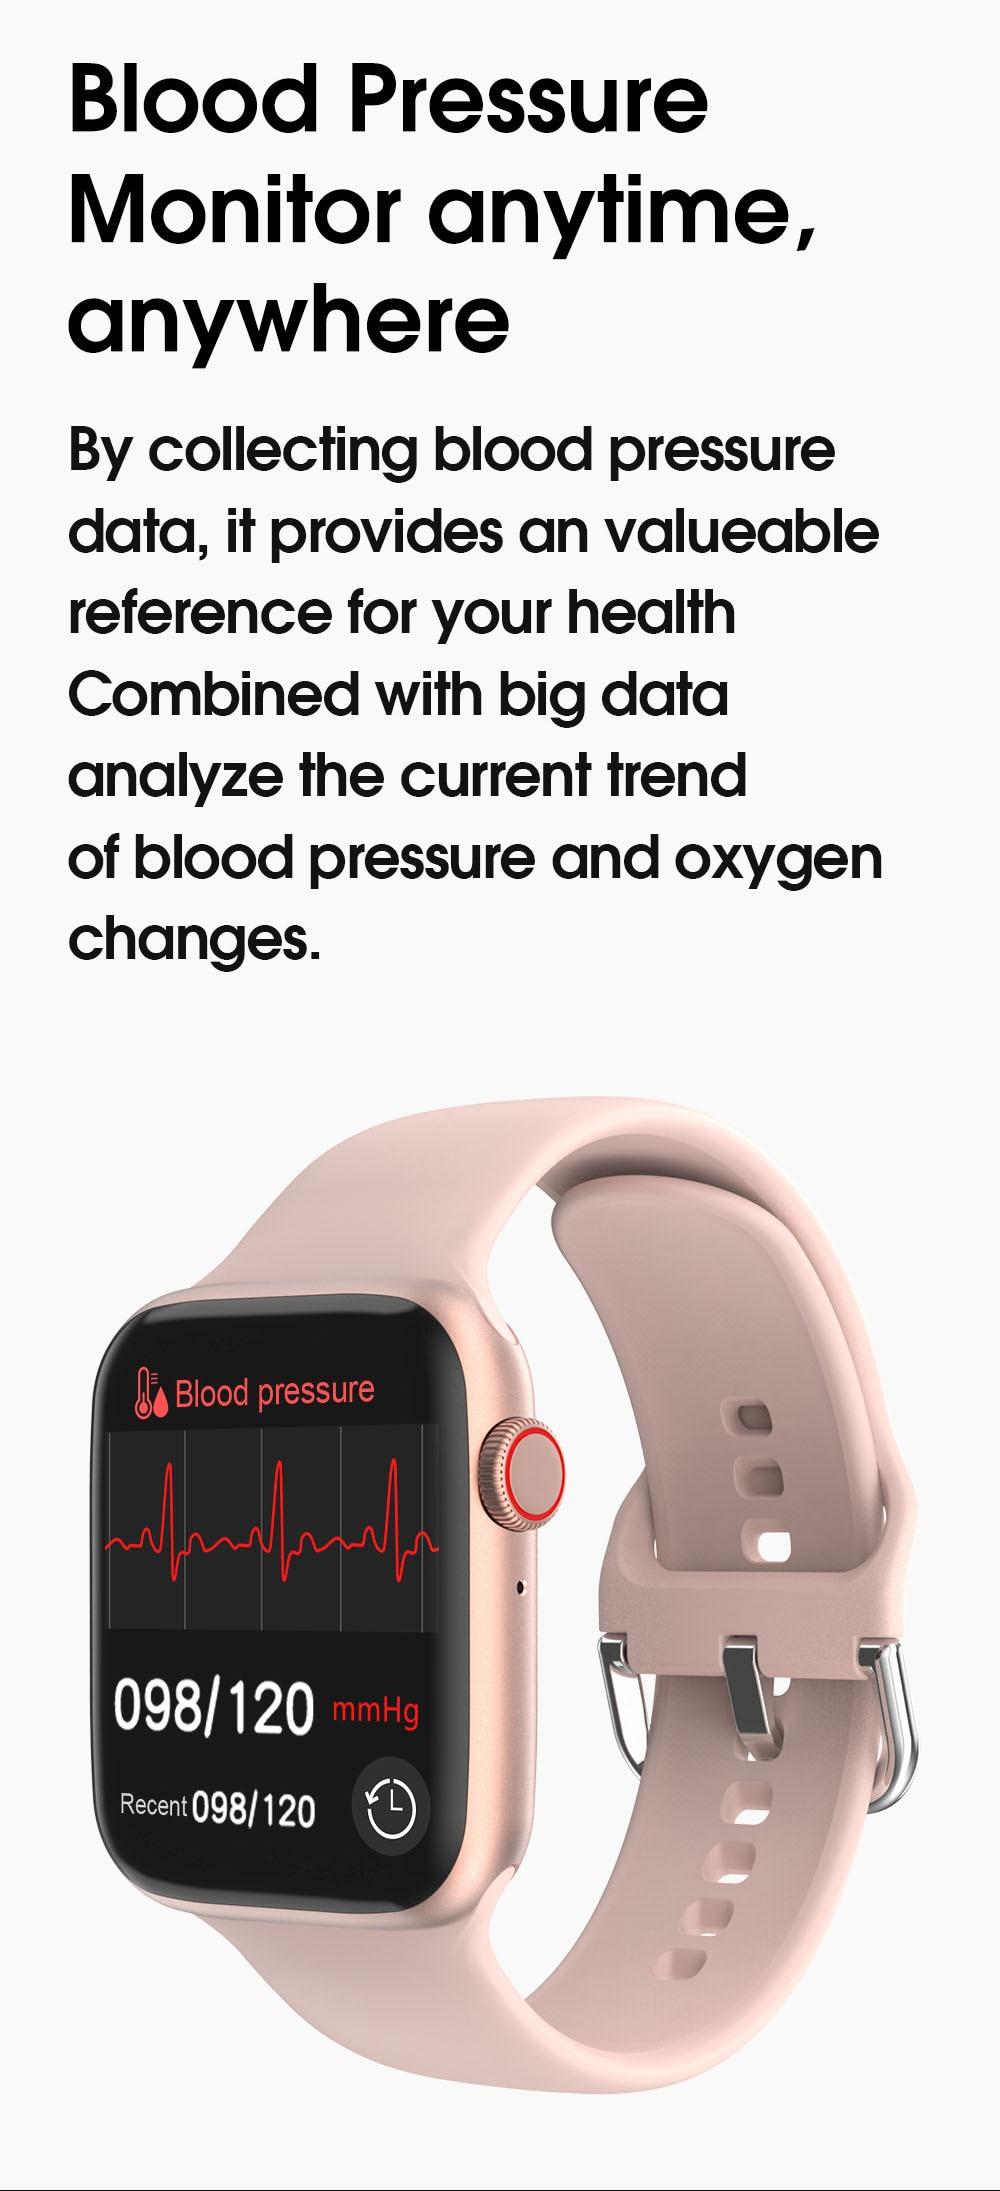 H706f30cffa014ff5ae0c0258dcc6fe1eD TREZER IWO W26+ Pro Smart Watch 1.75 Inch 320*385 Series 6 IPS Full Touch Screen Custom Watch Face Smartwatch Men Women PK HW22